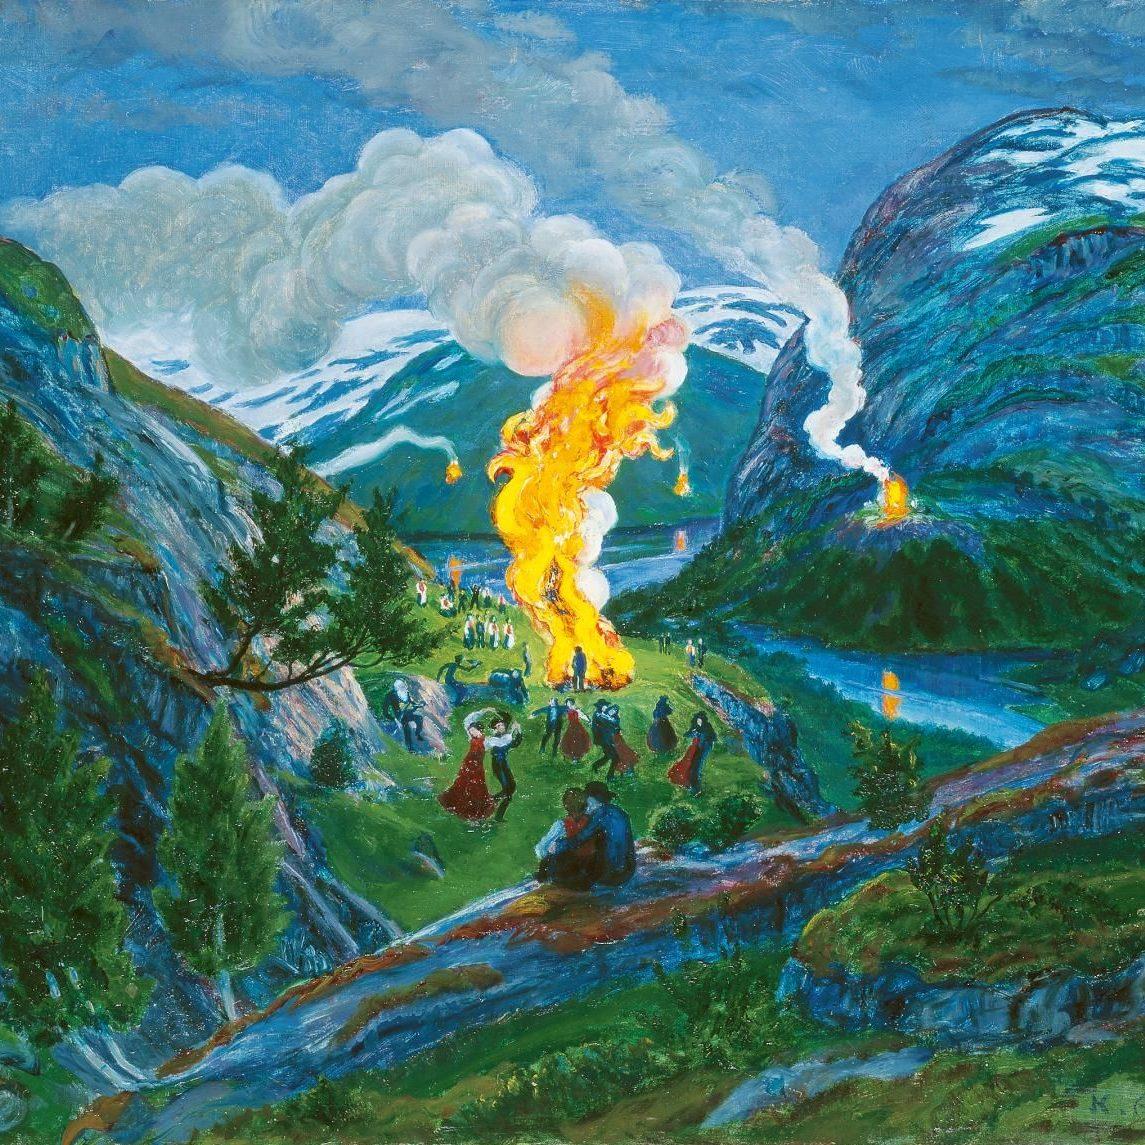 """Vestlandet"" by Nikolai Astrup (1880-1928): From the KODE Art Museums of Bergen, Norway"